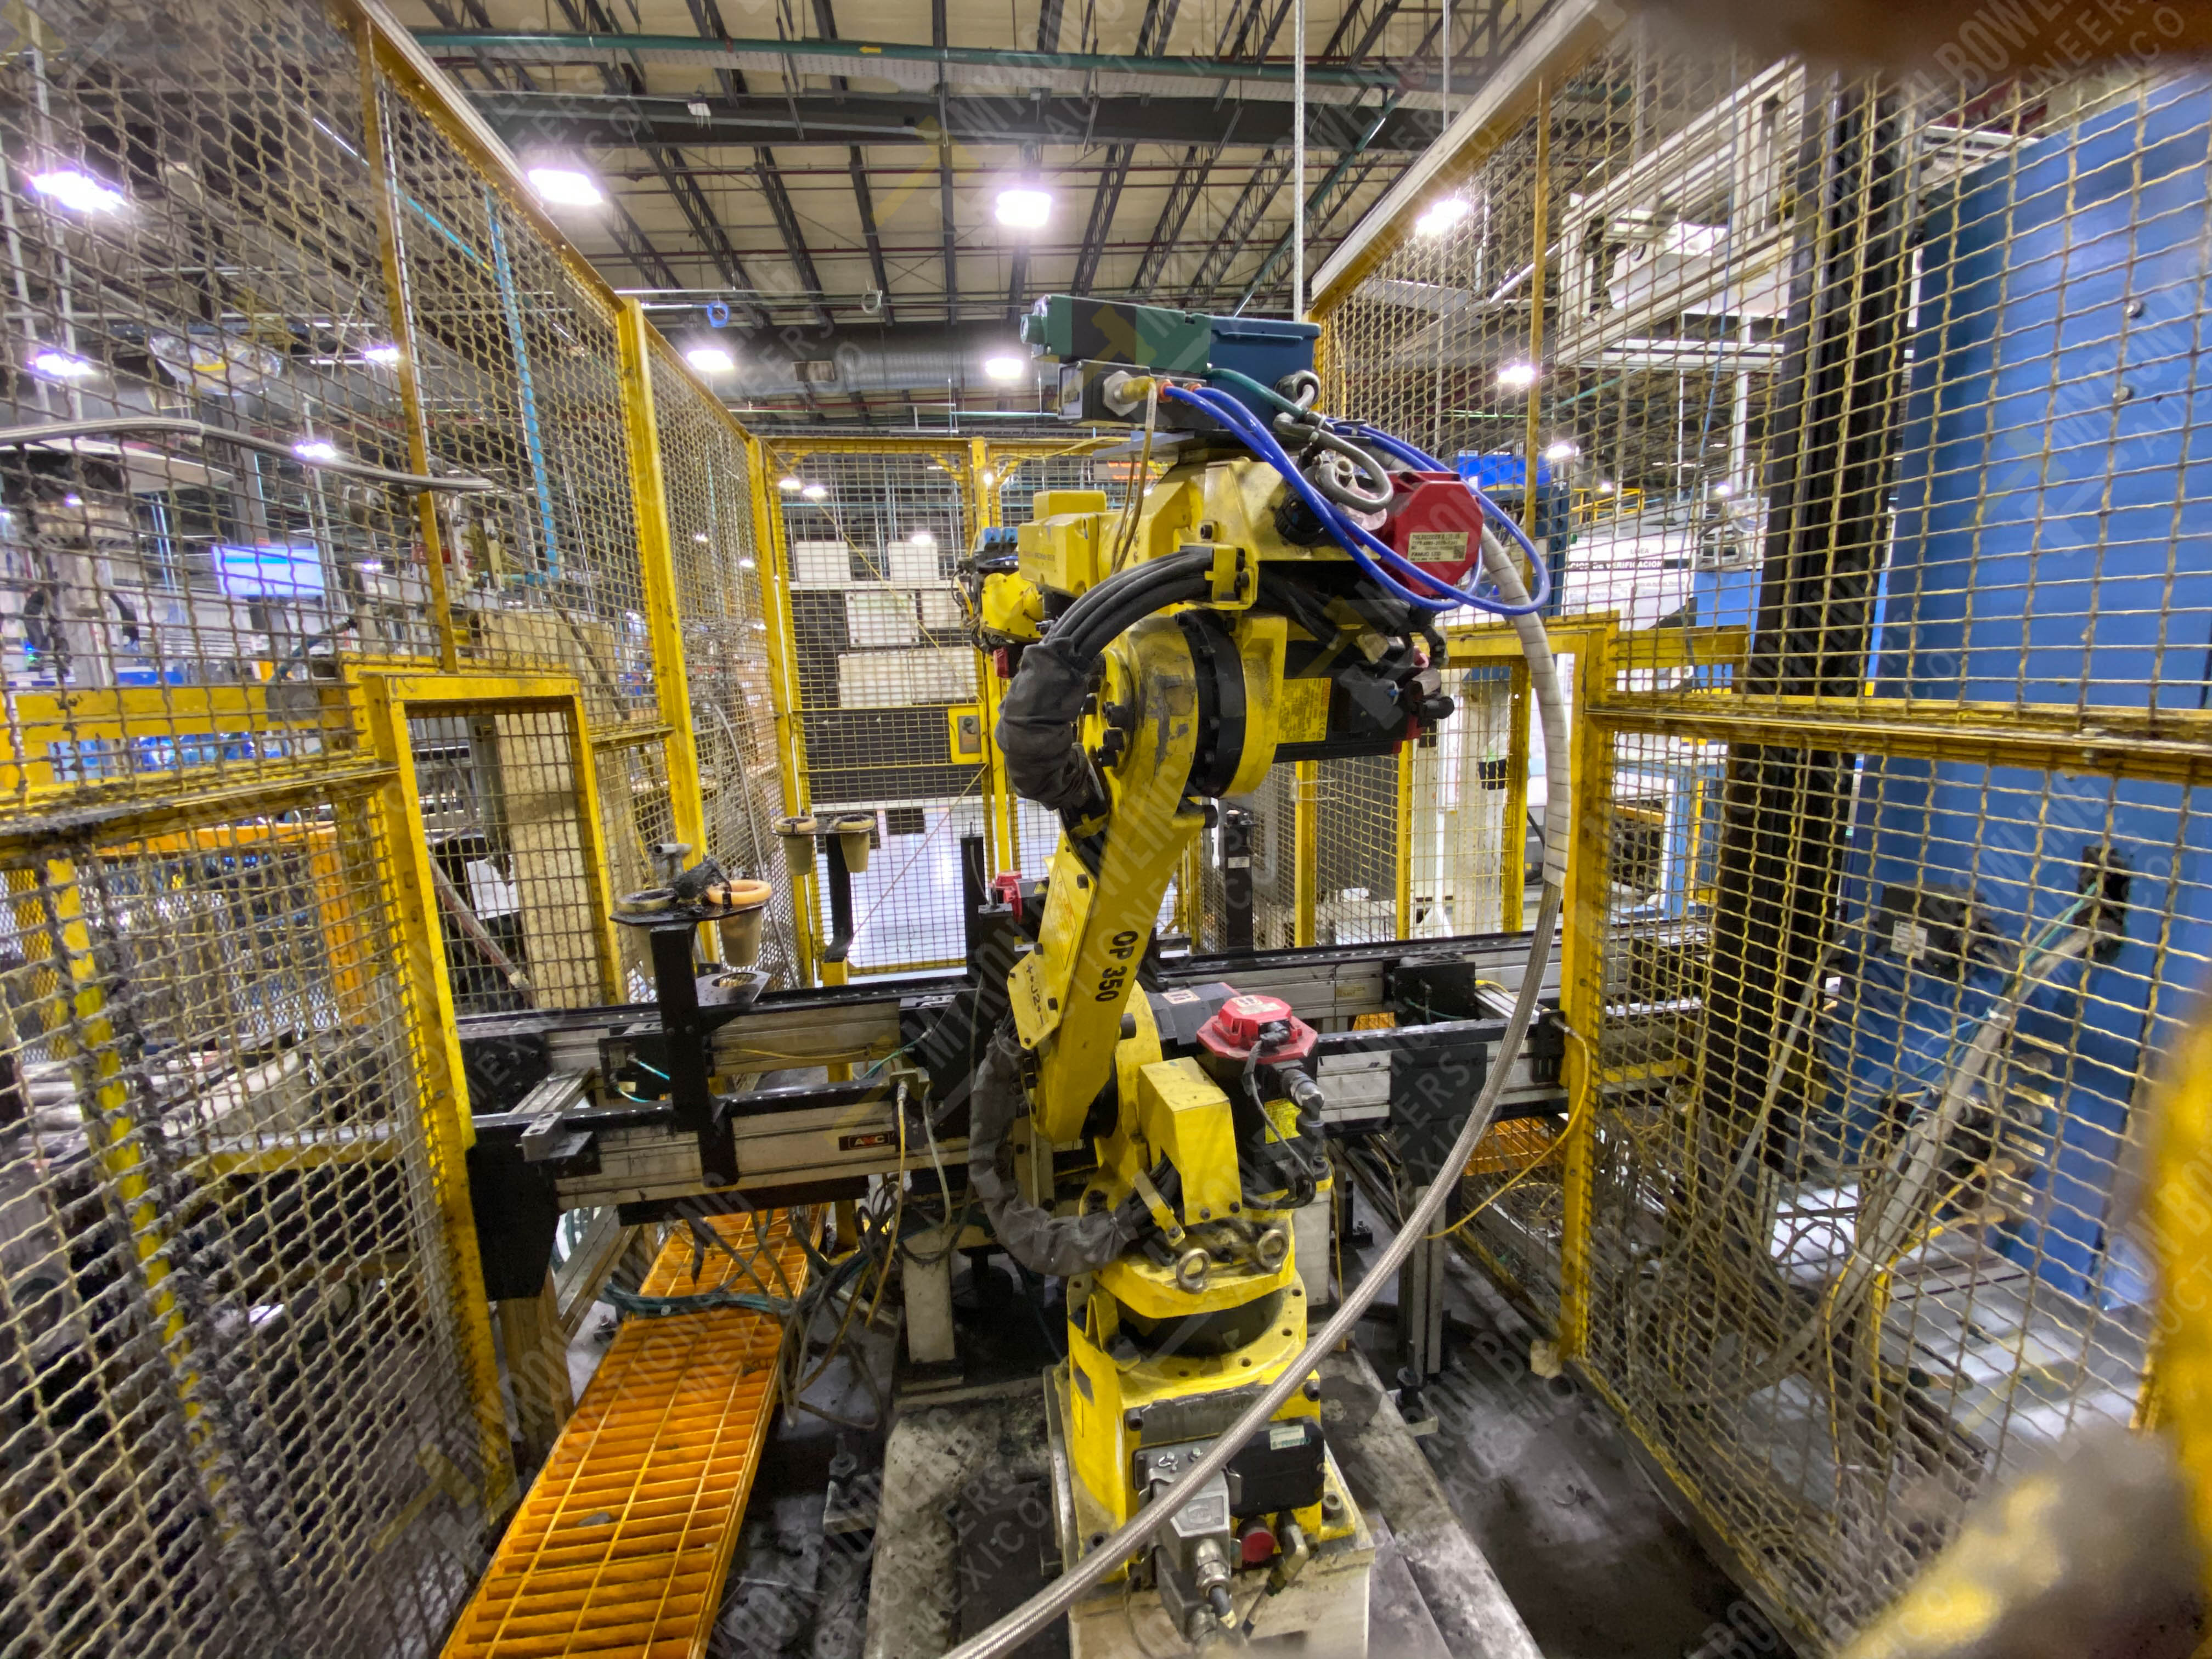 Robot marca Fanuc con capacidad de carga de 15-30 Kg, controlador de robot y teach pendant - Image 3 of 14